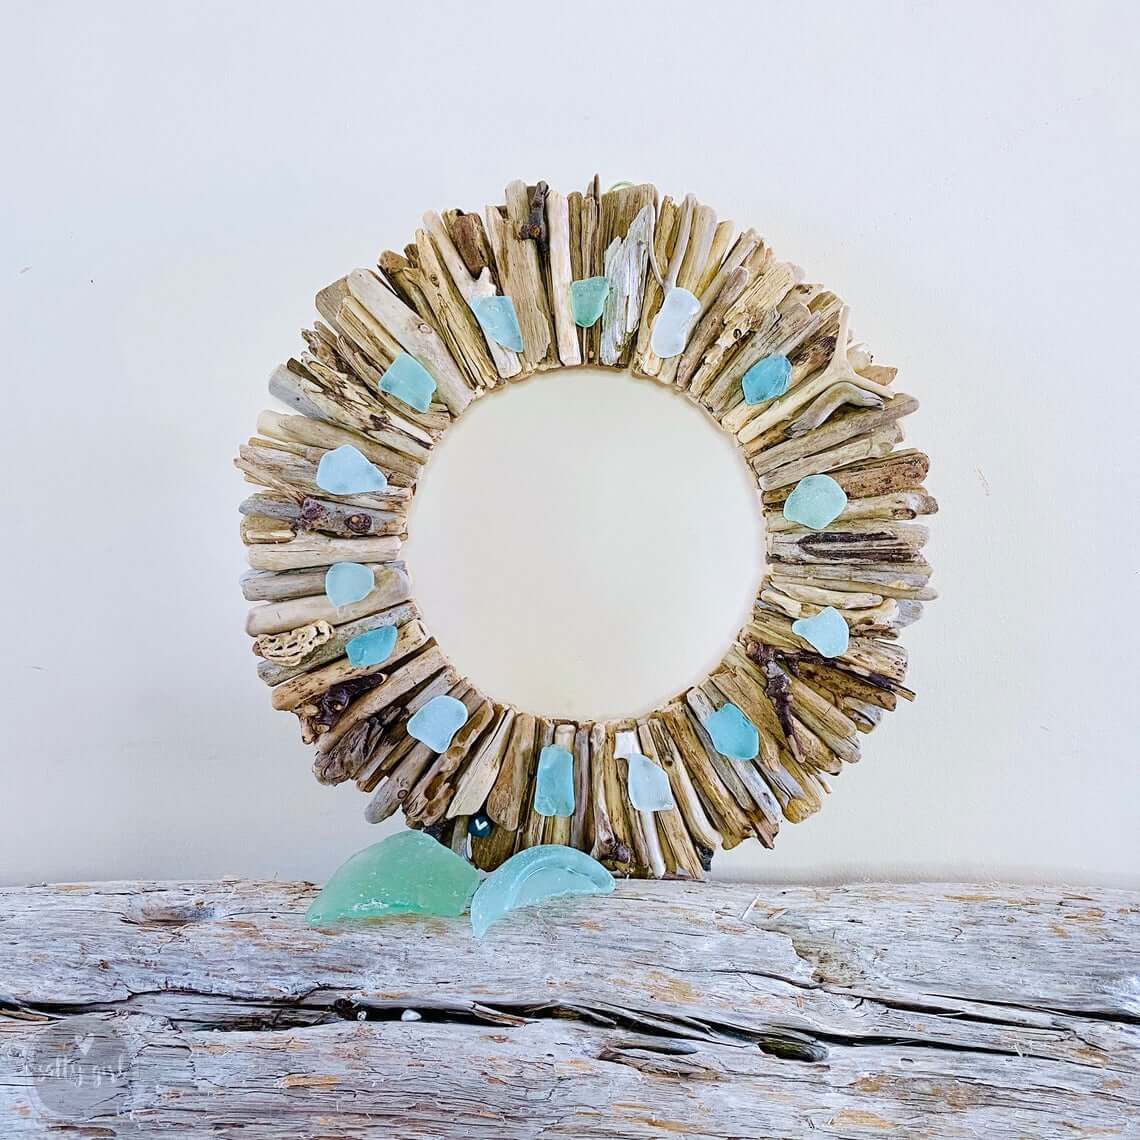 Sea Glass Sunburst DIY Driftwood Wreath